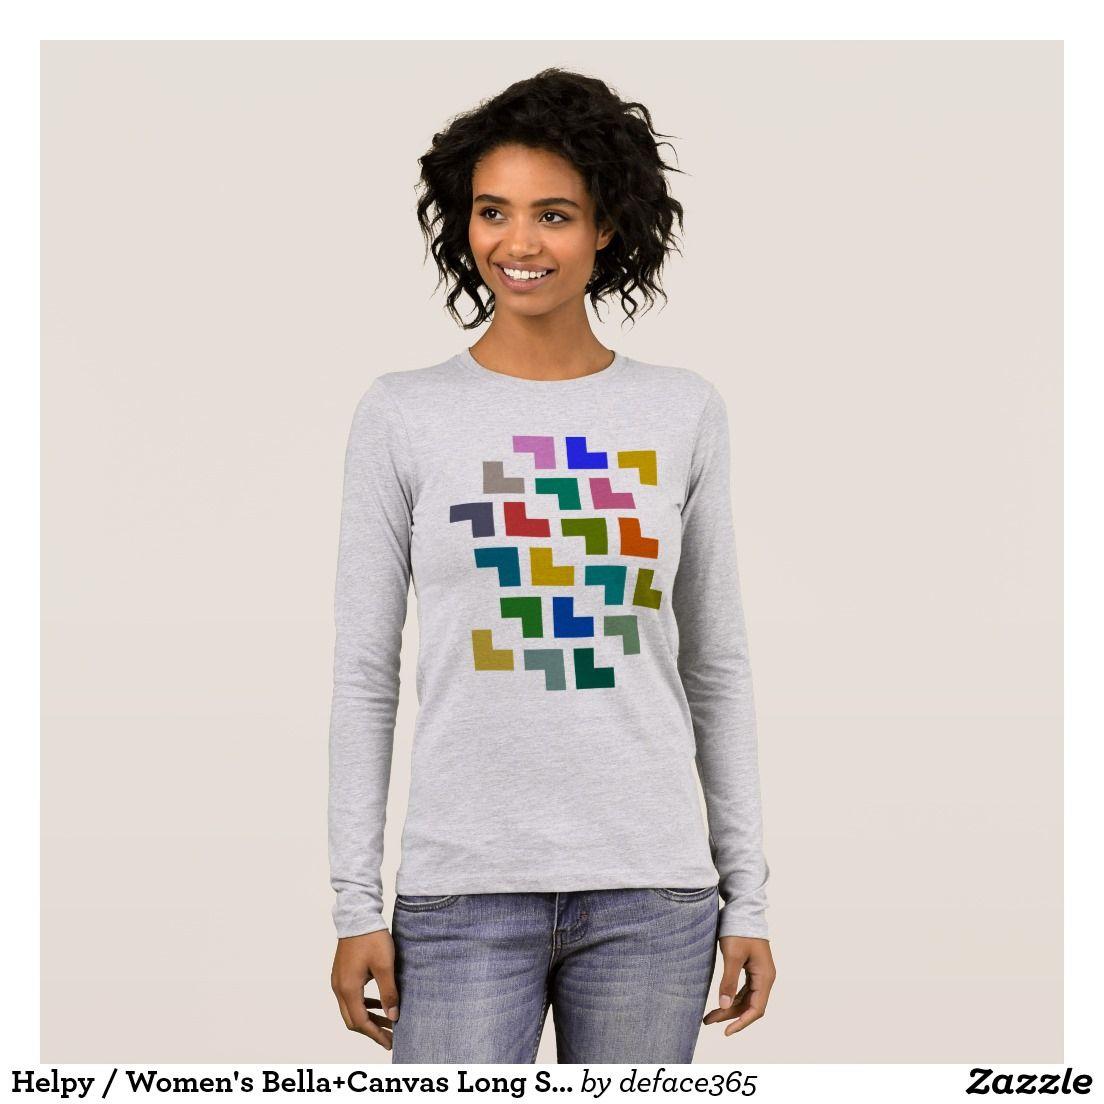 Helpy / Women's Bella+Canvas Long Sleeve TShirt Zazzle